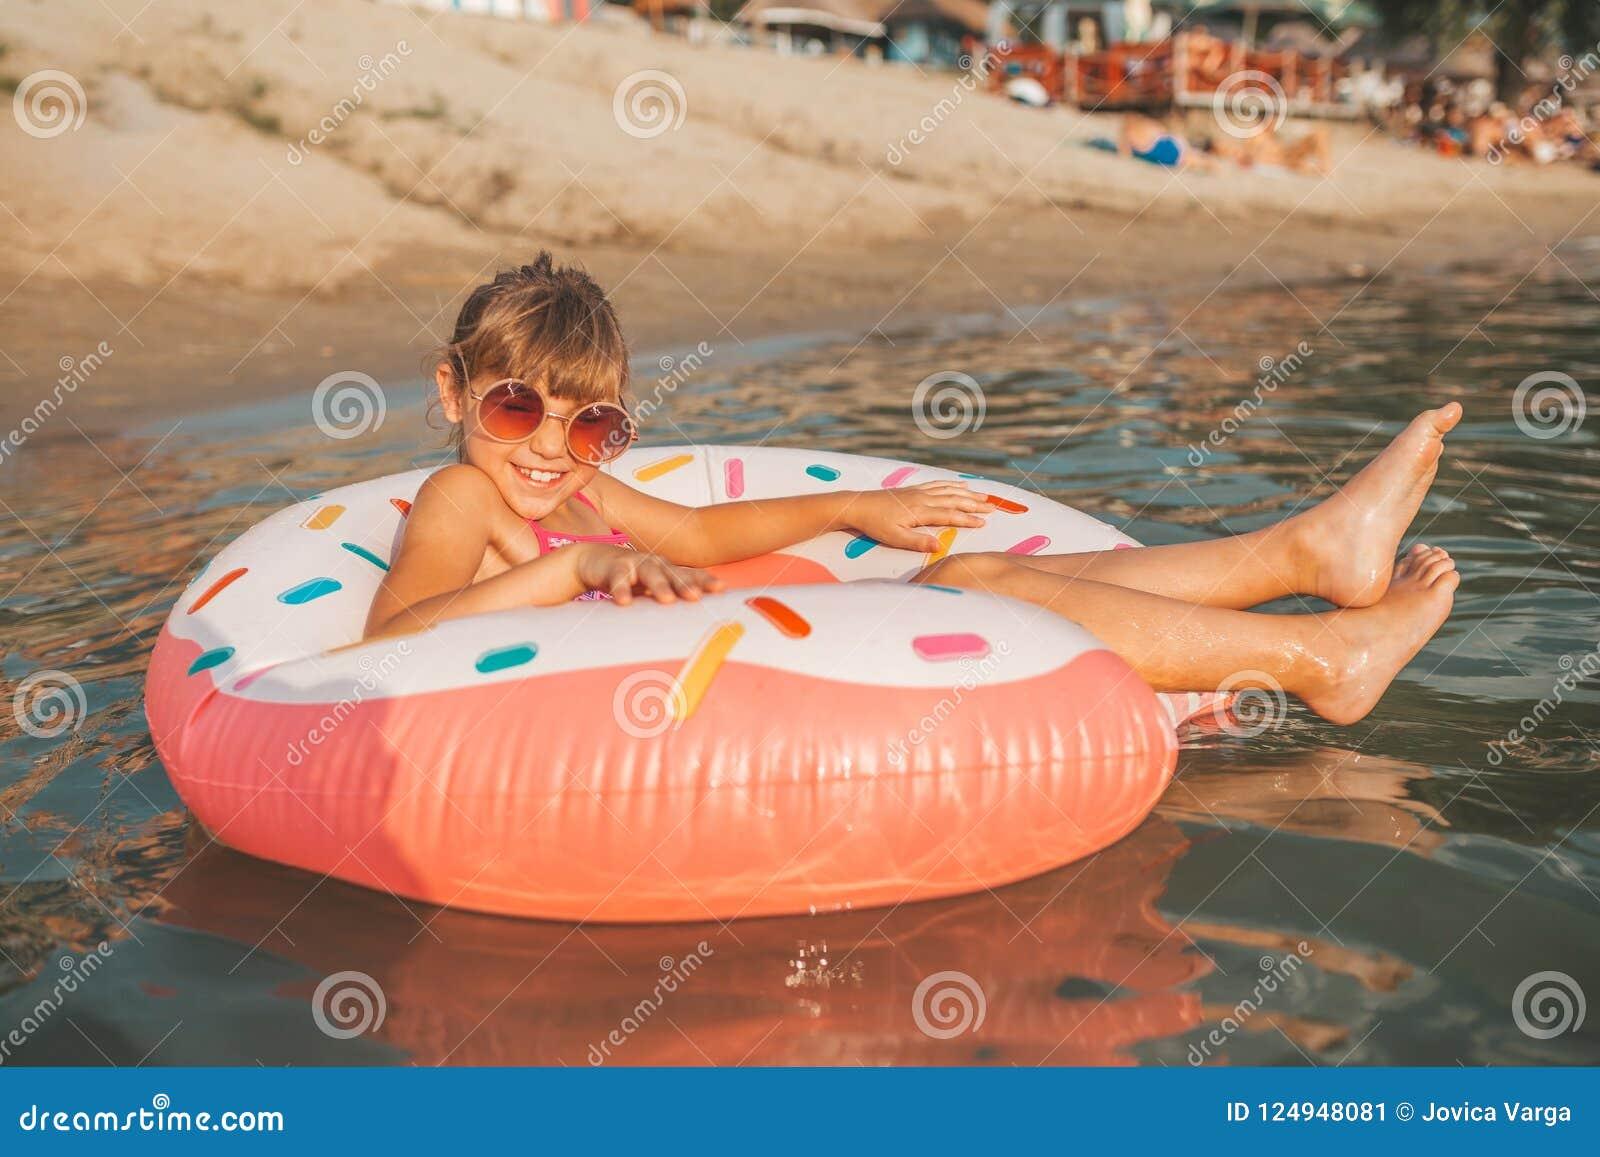 Meisje het spelen met opblaasbare ring in water